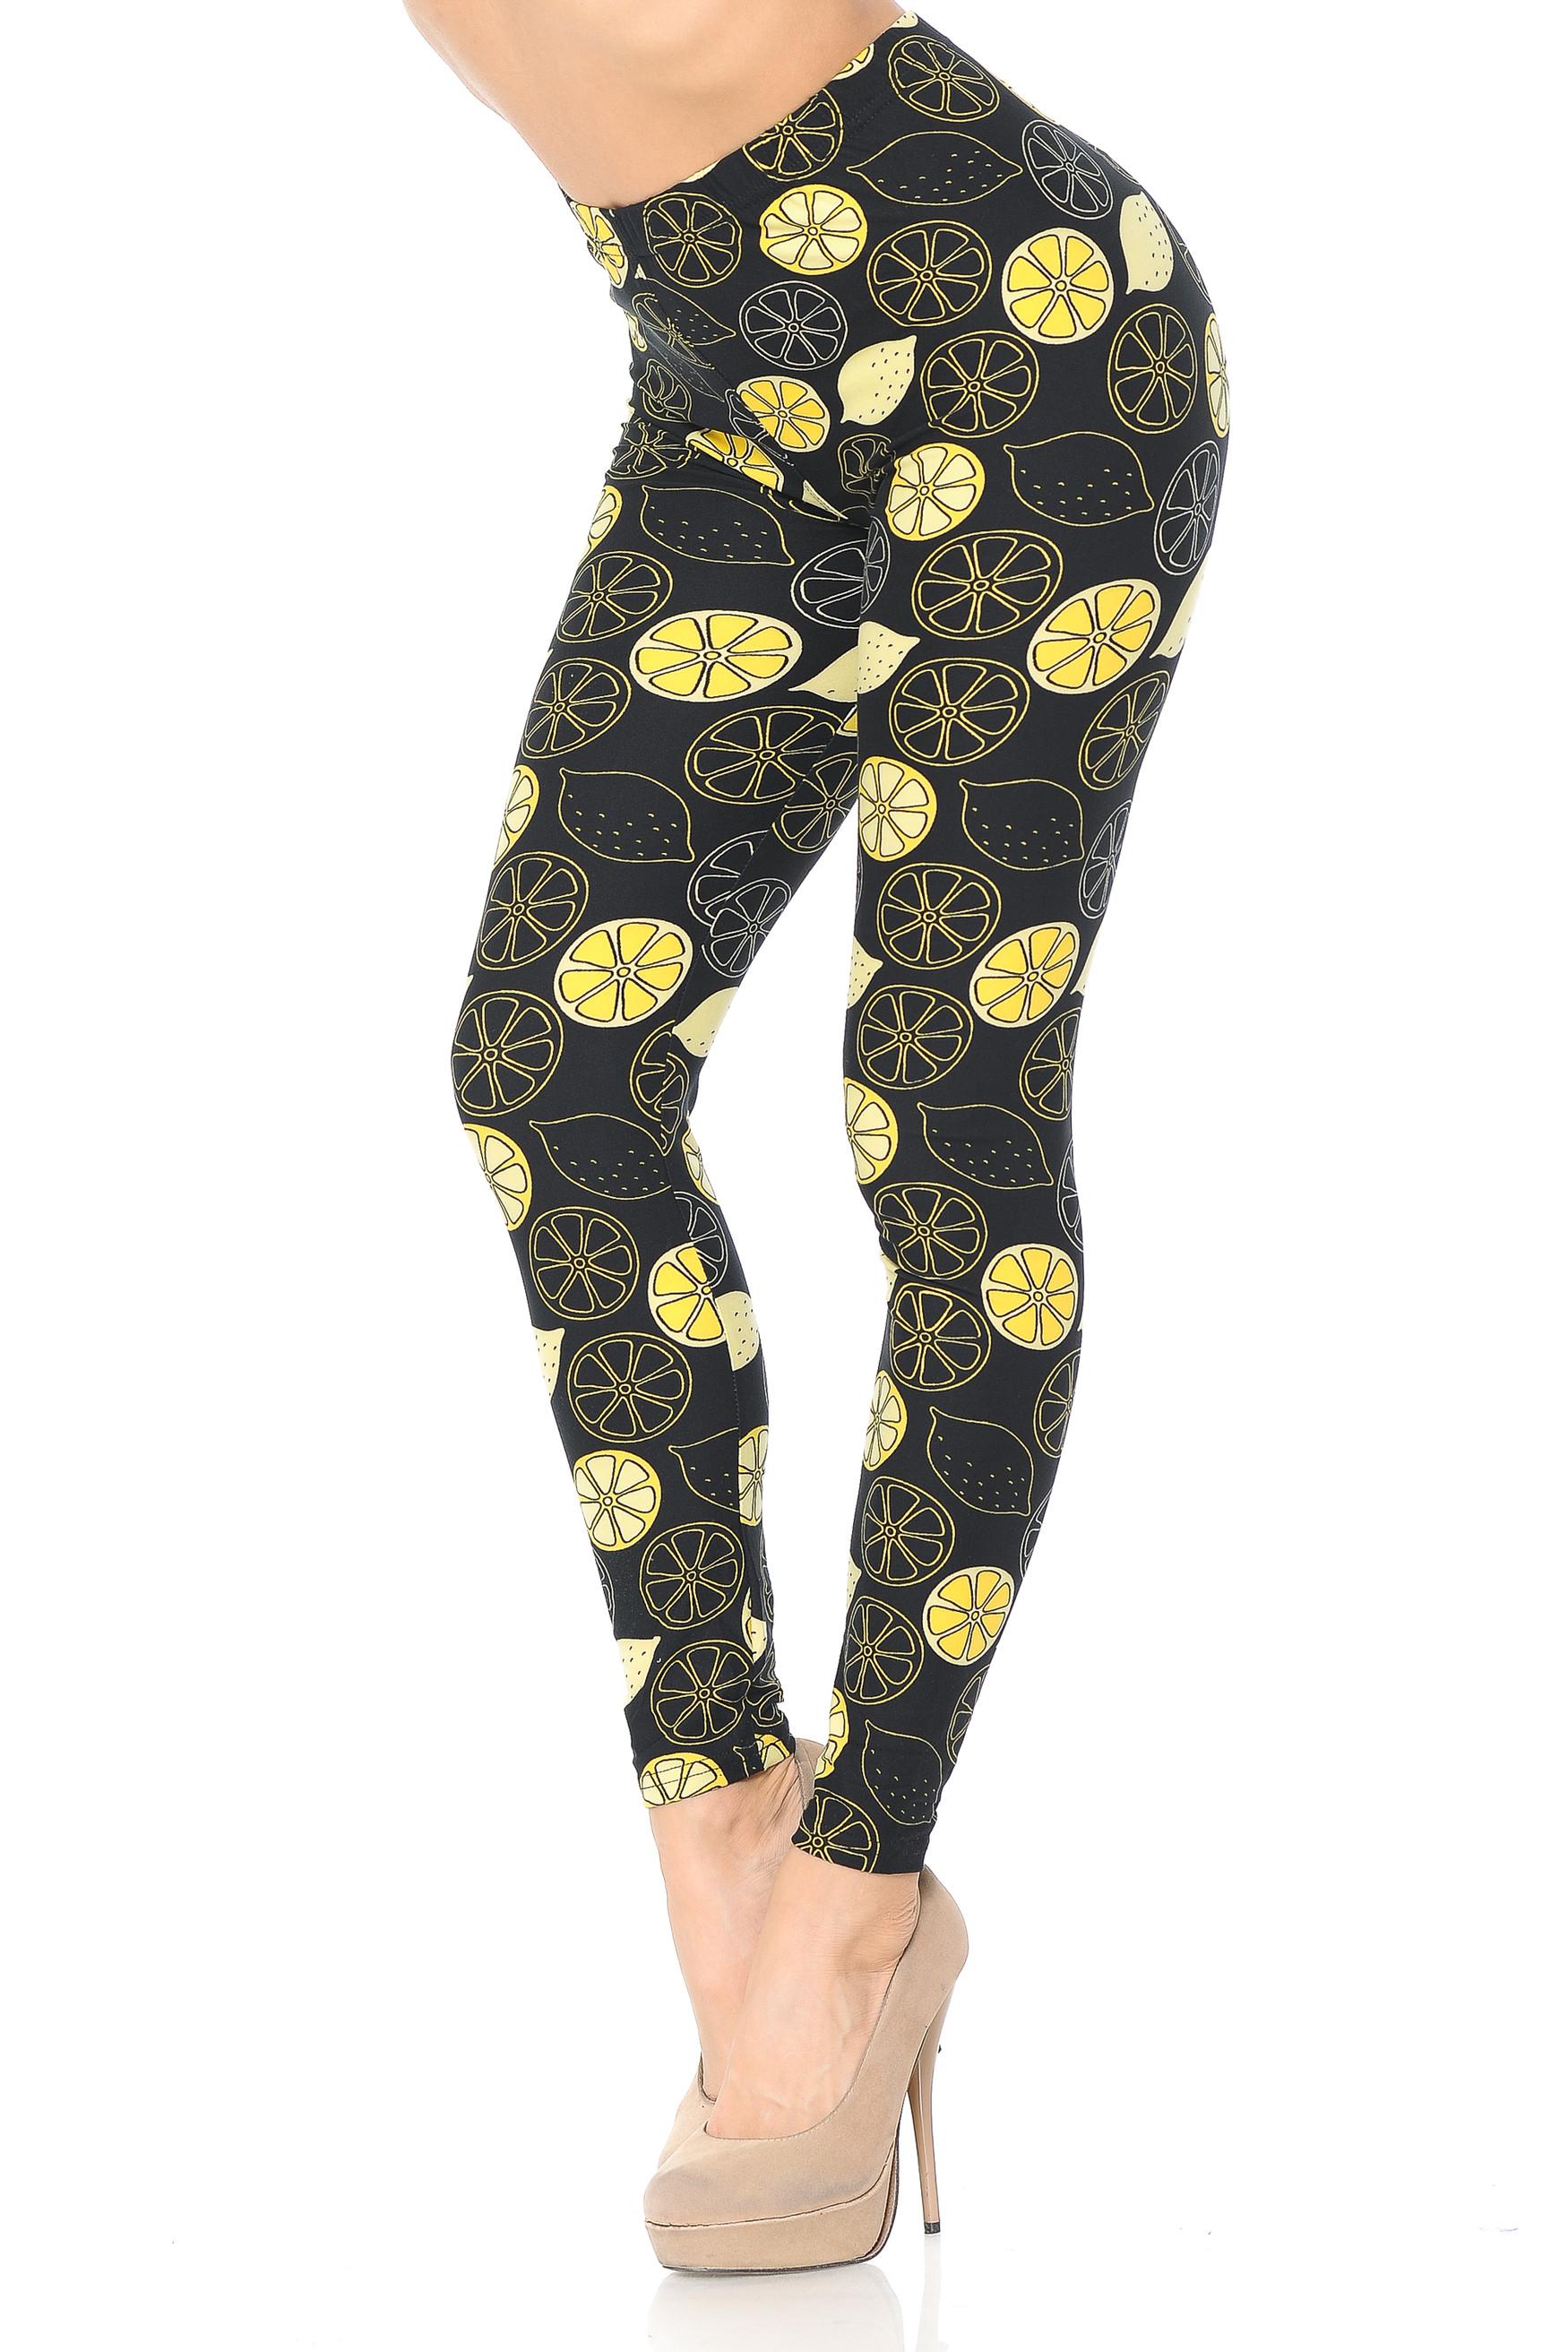 Wholesale Buttery Soft Juicy Summer Lemons  Leggings